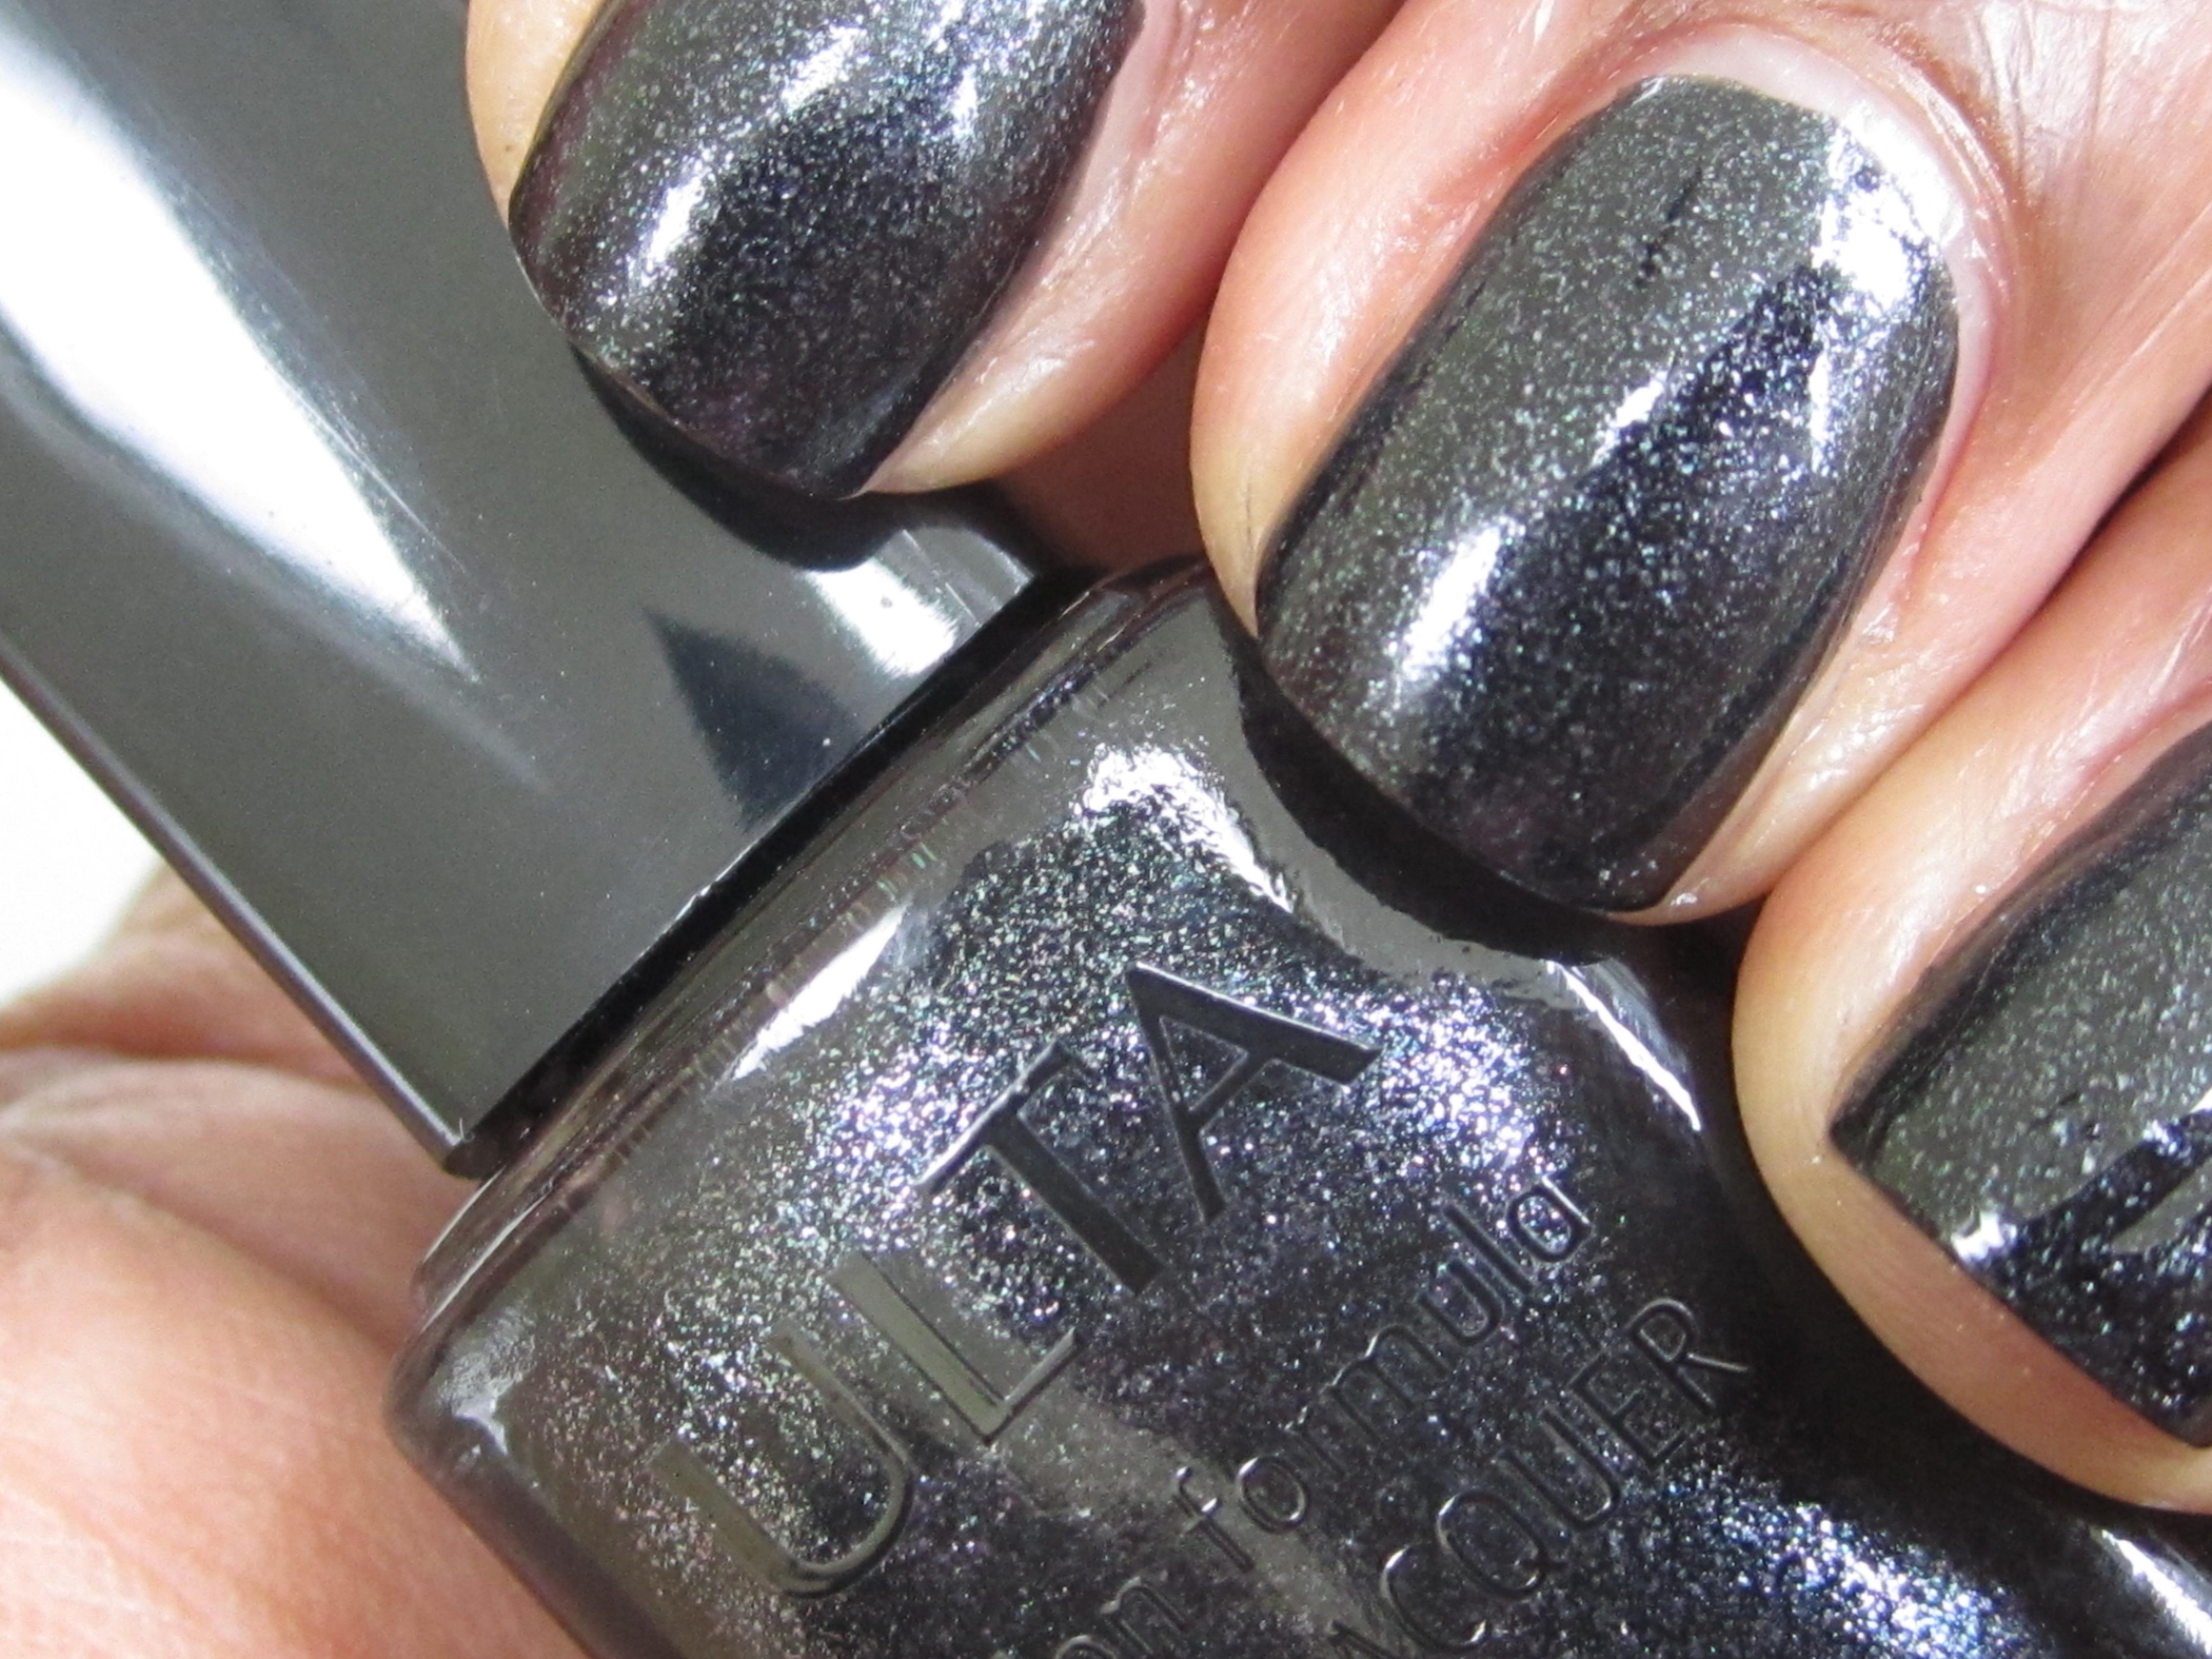 NOTD: Ulta Little Black Dress Nail Polish